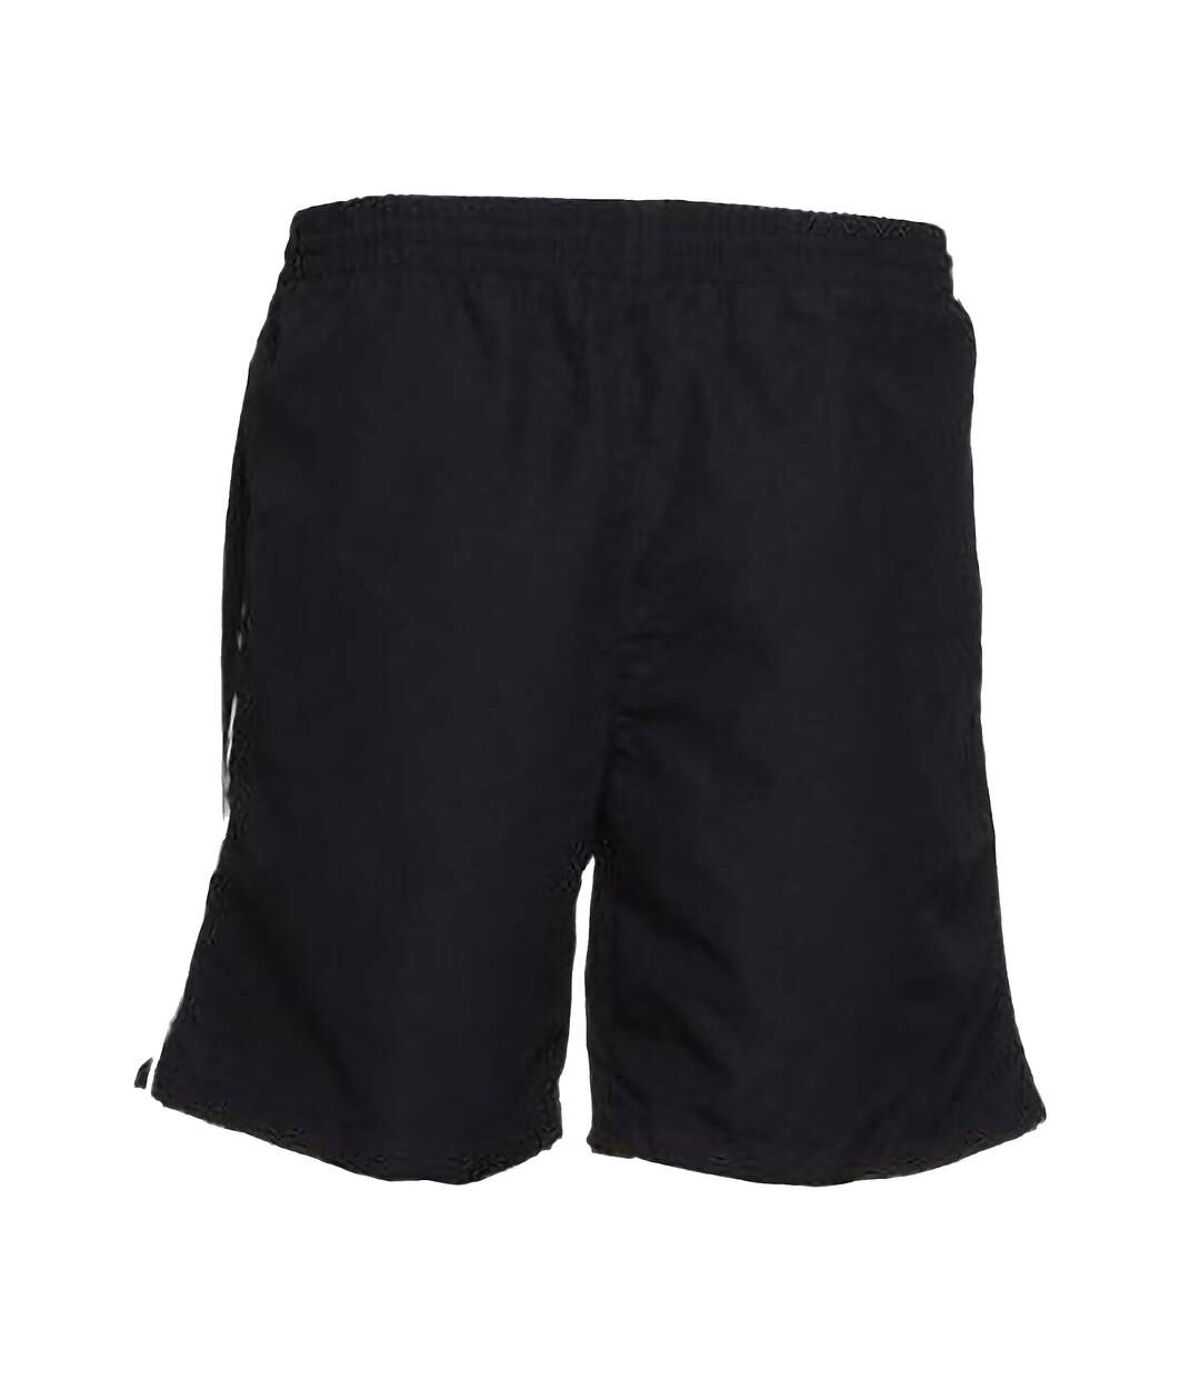 Gamegear® Track Sports Shorts / Mens Sportswear (Black/White) - UTBC439